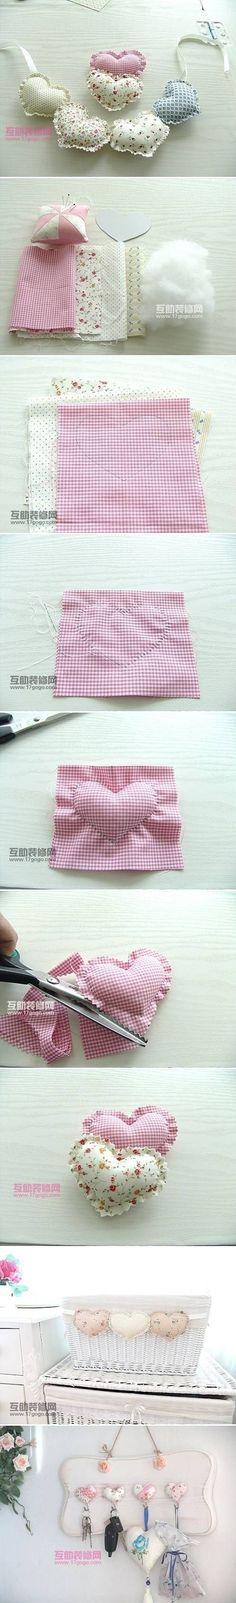 DIY Fabric Heart Pendant DIY Projects / UsefulDIY.com